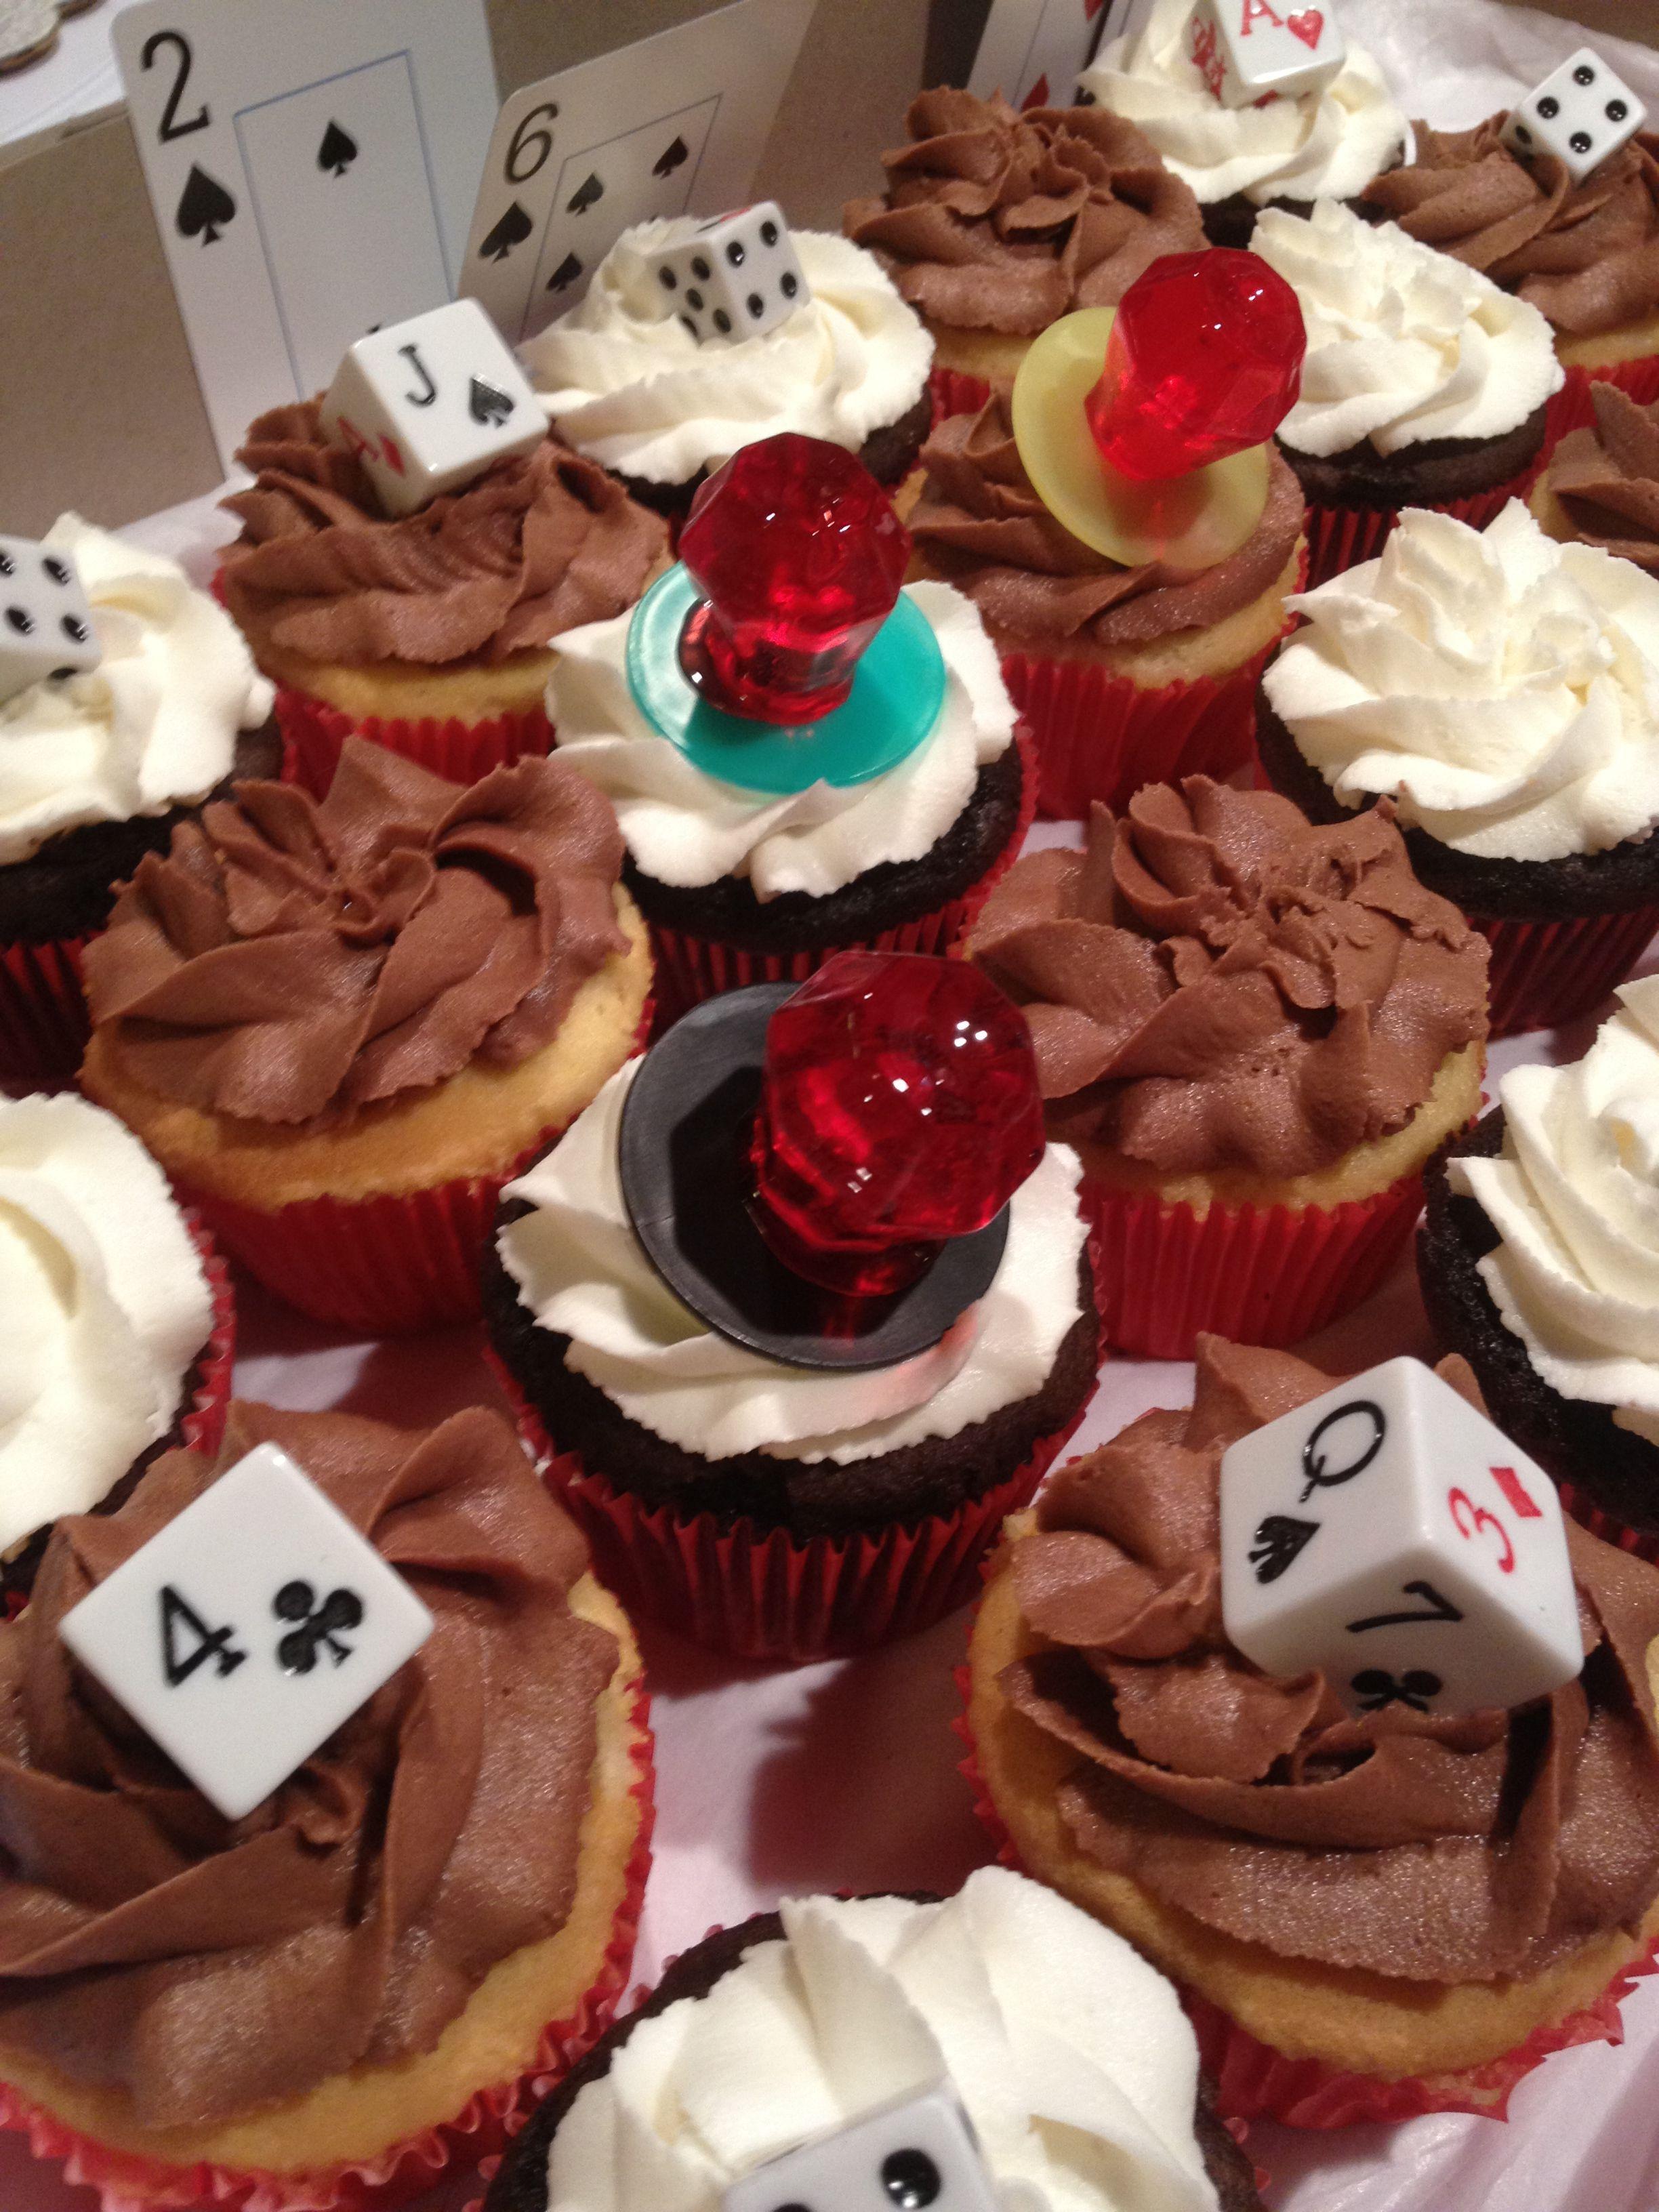 vegas themed wedding shower cupcakes by twiggs n berries bake shoppe